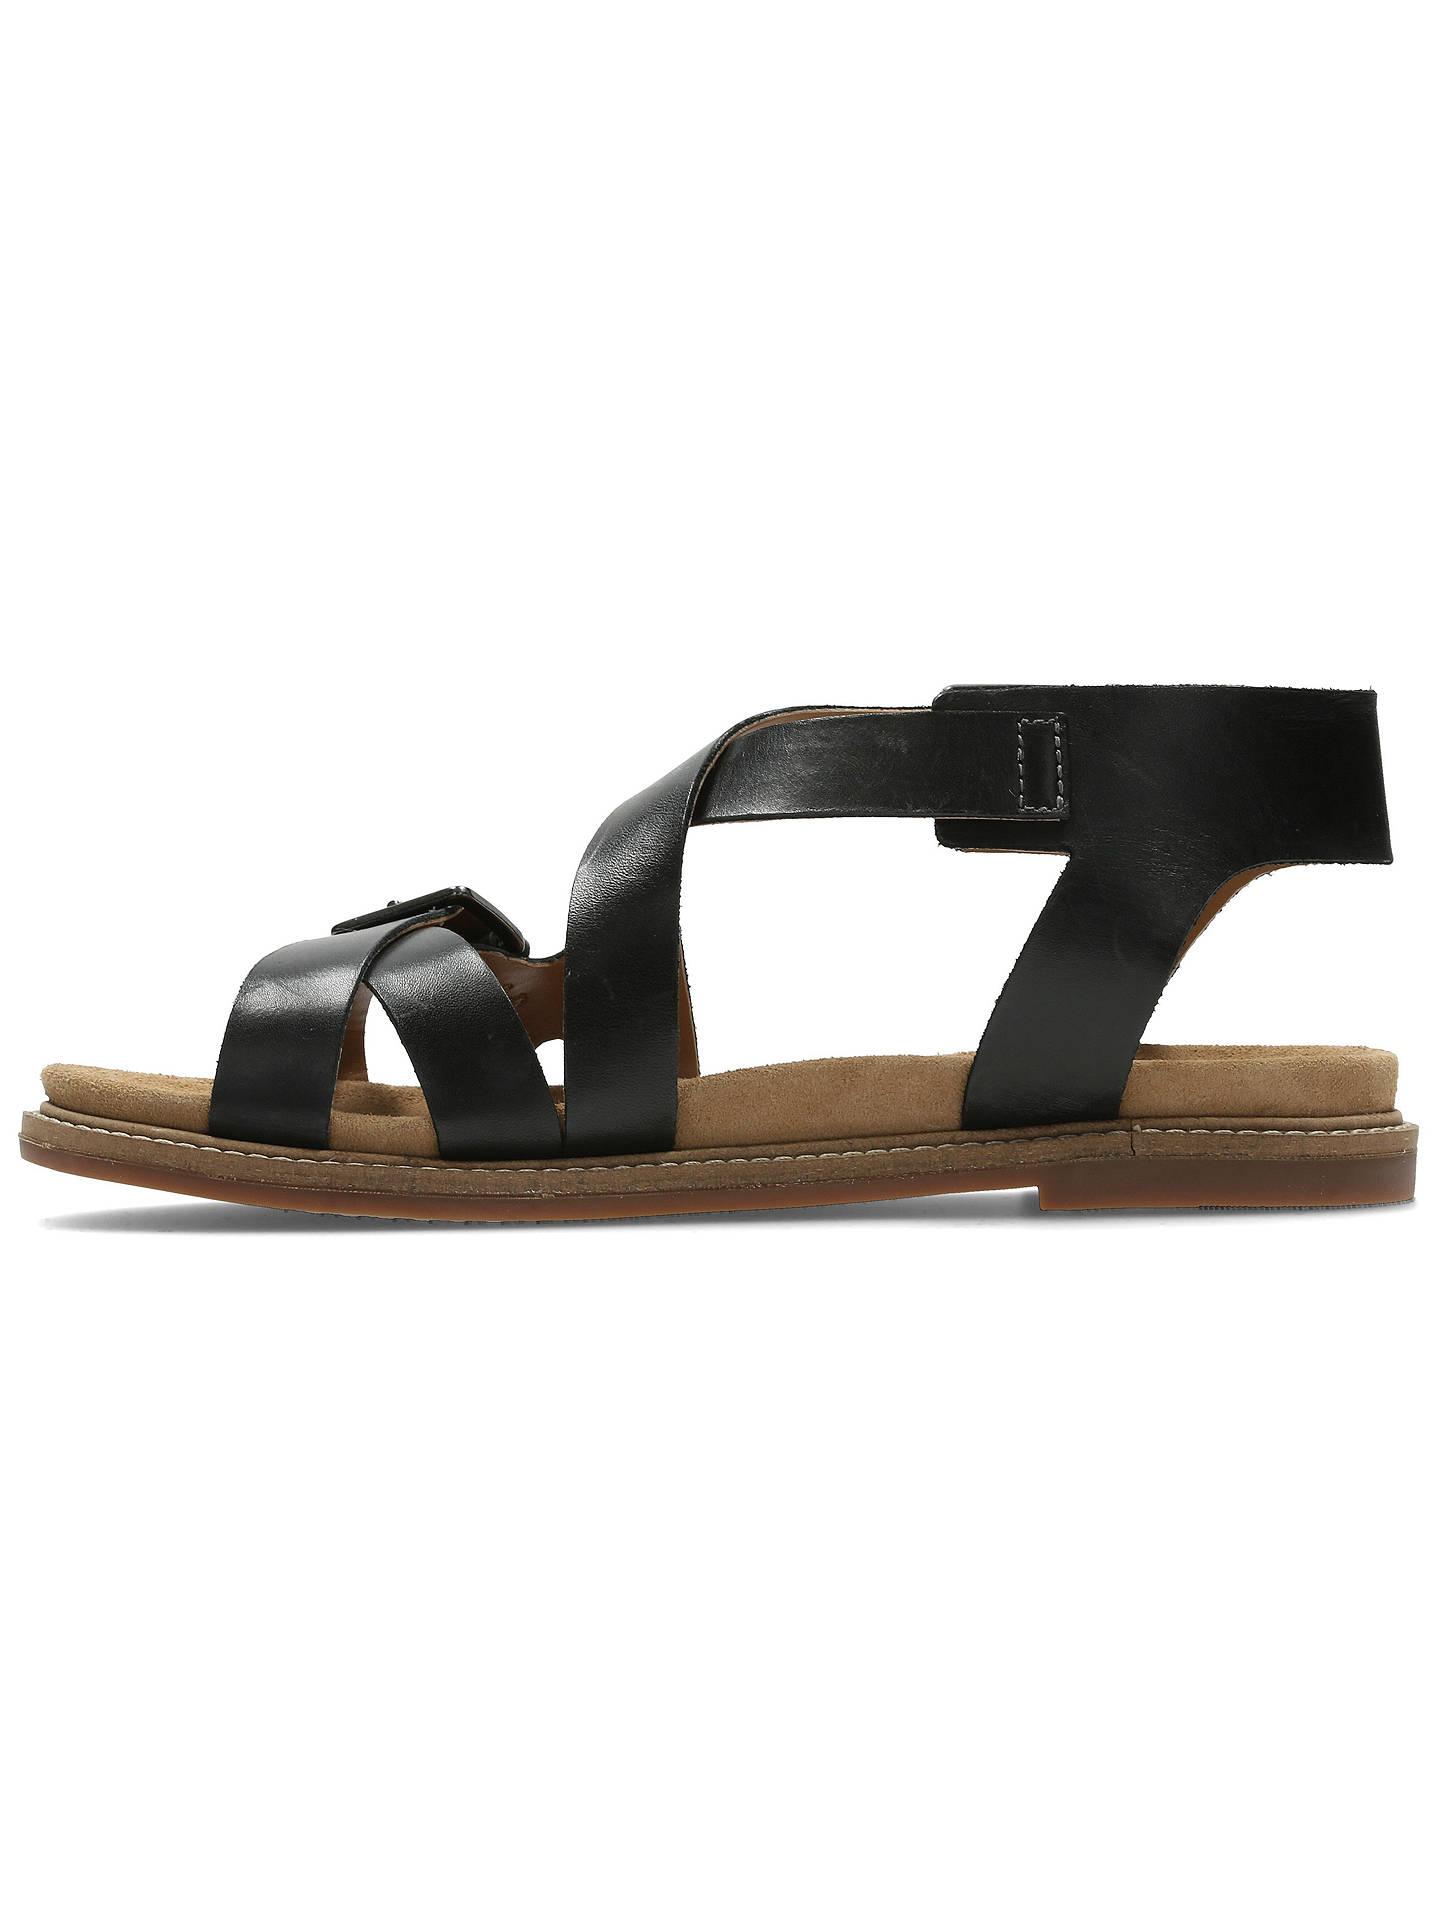 204dab40f5c ... Buy Clarks Corsio Bambi Cross Strap Sandals